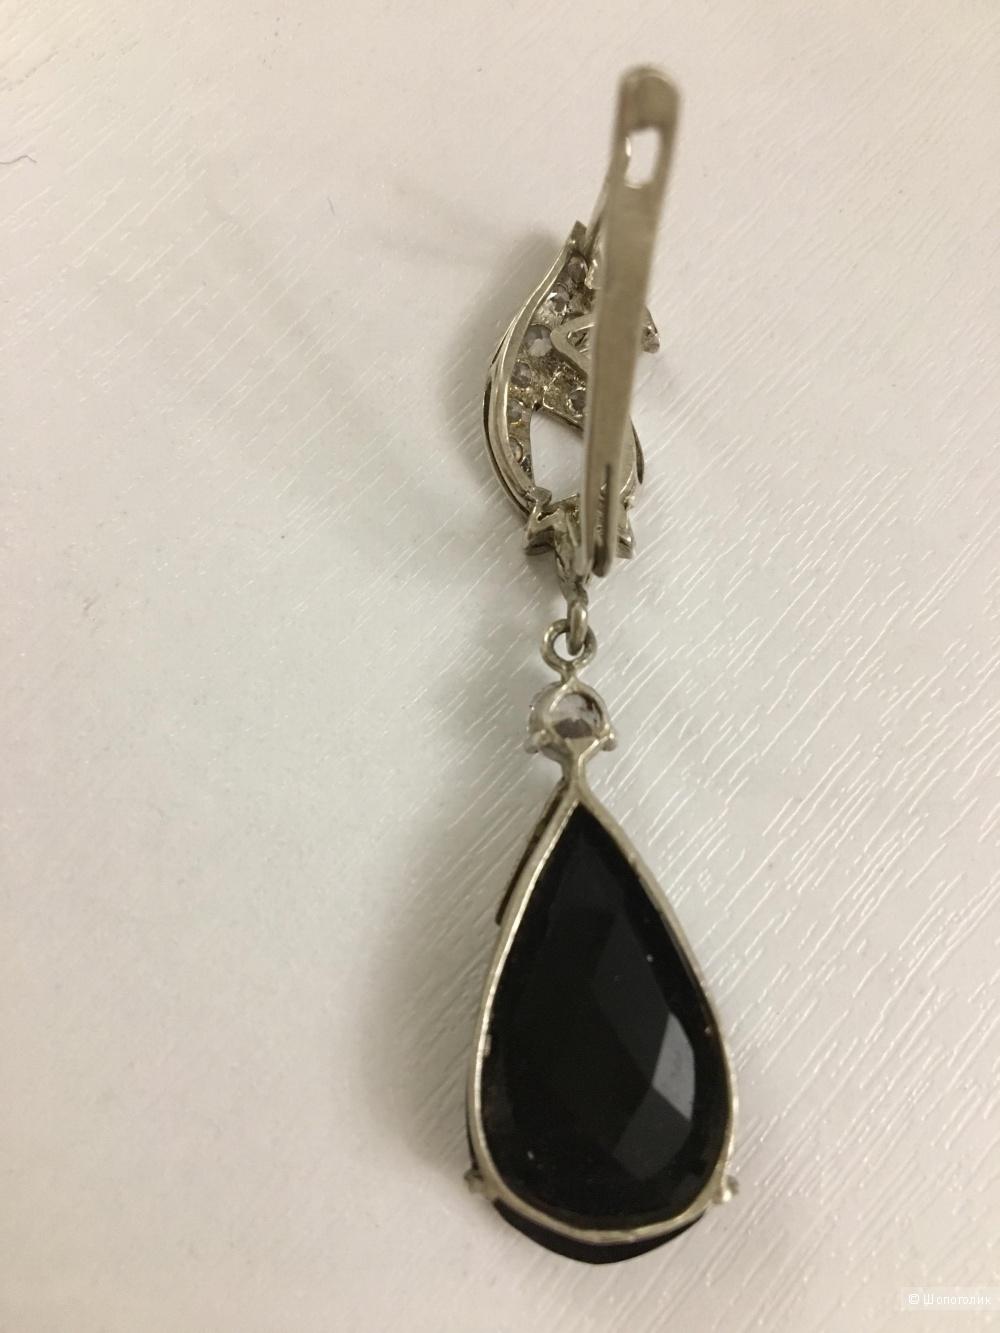 Комплект: серьги и кольцо, серебро